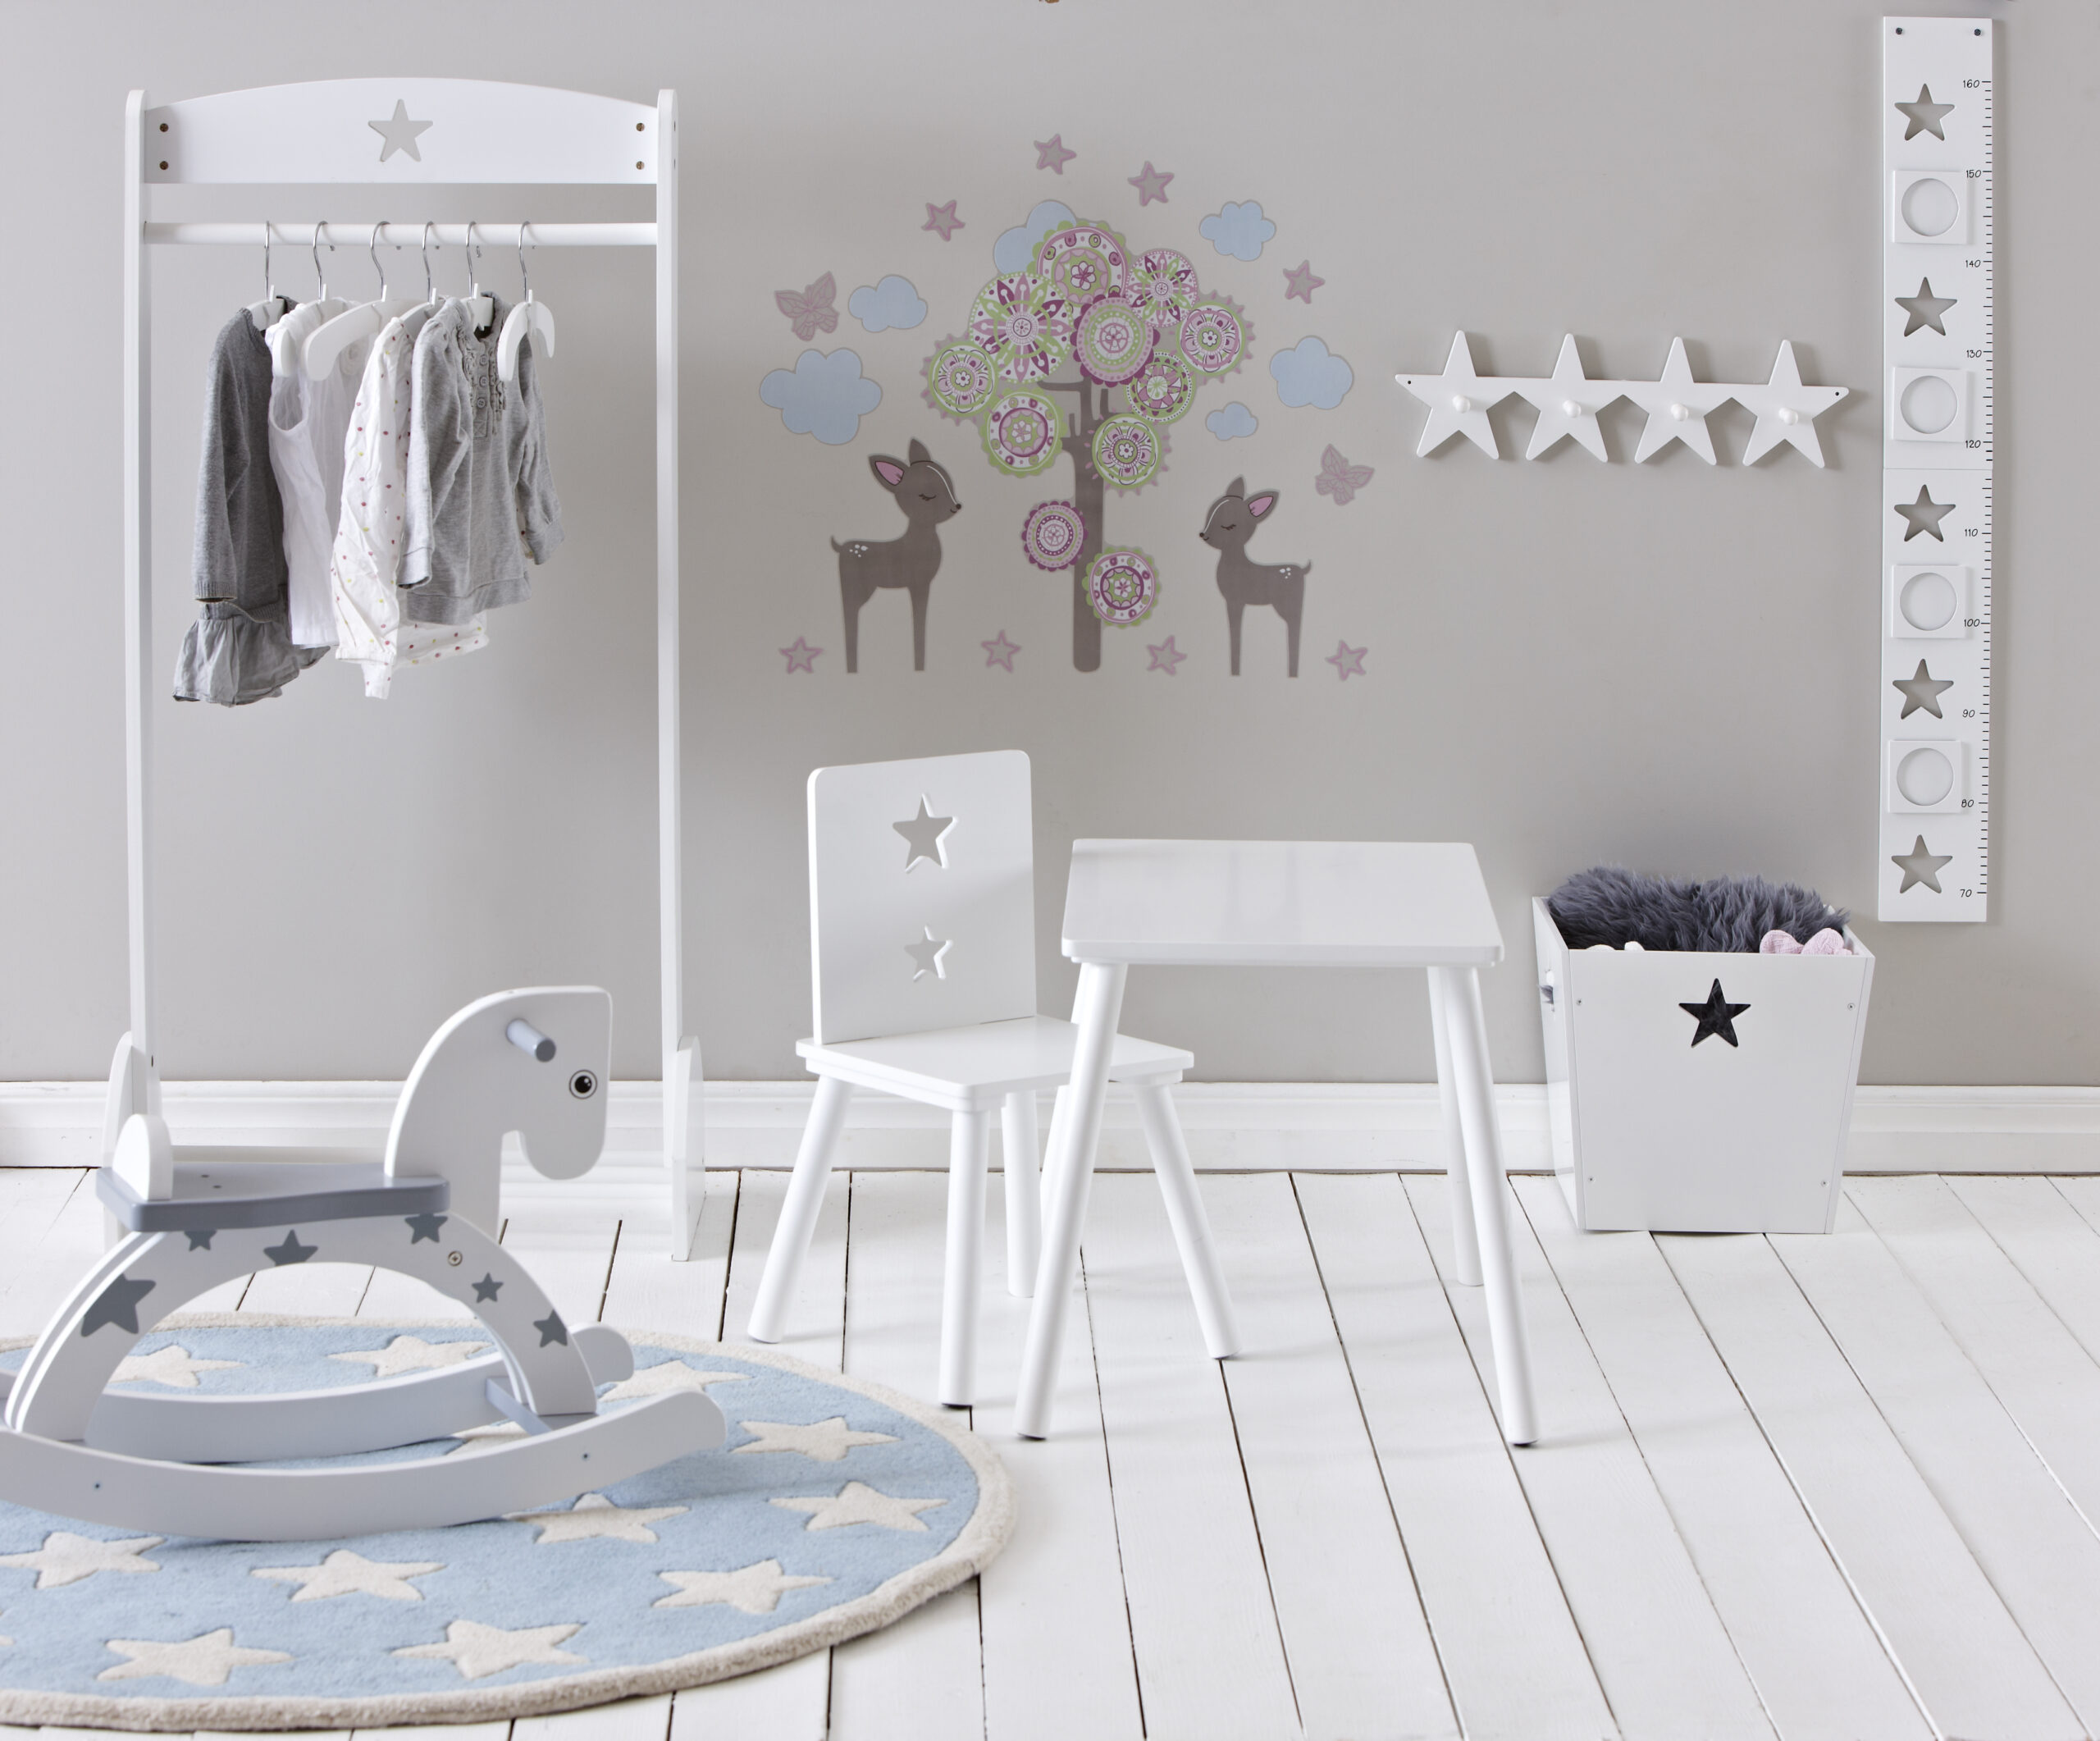 Full Size of Garderobe Kinderzimmer Kleiderhaken 4 Fach Star Wei Kidsconcept Lovely Little Regal Sofa Regale Weiß Kinderzimmer Garderobe Kinderzimmer